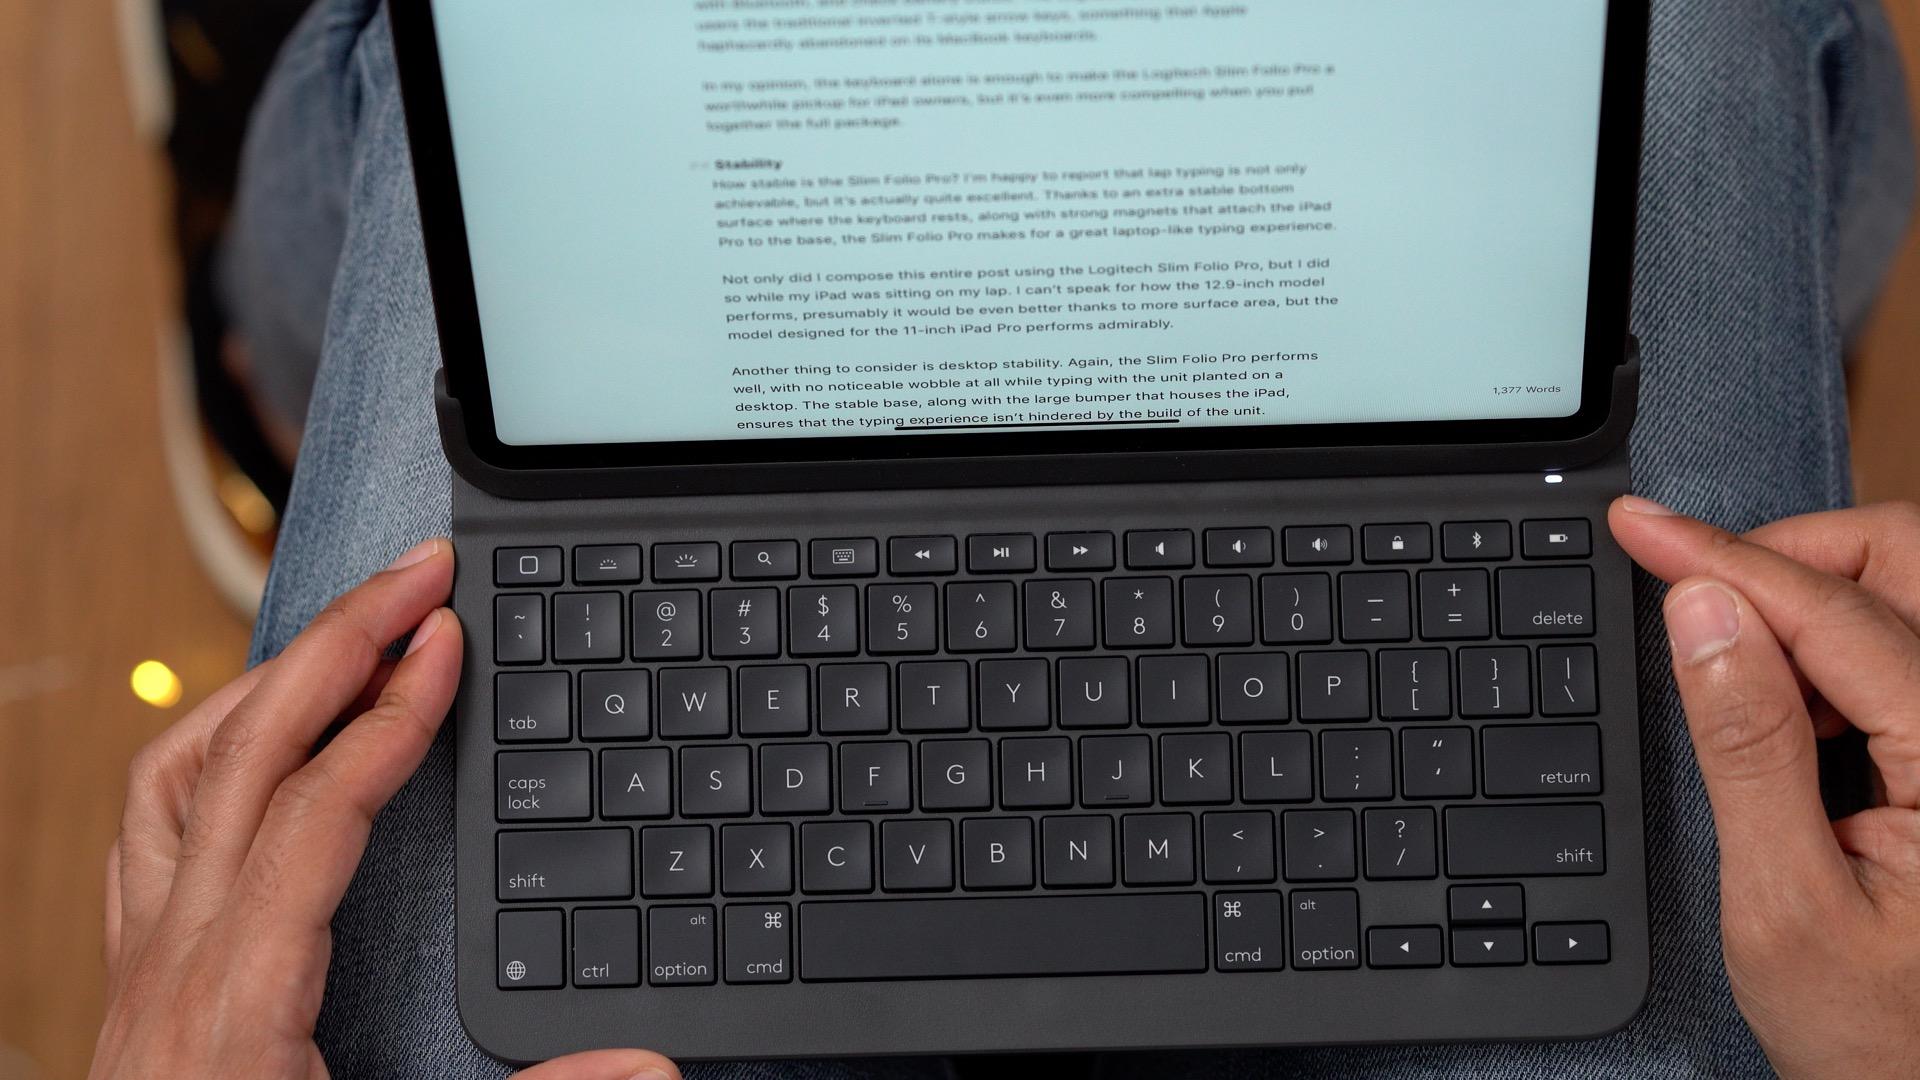 Logitech Slim Folio Pro lap typing